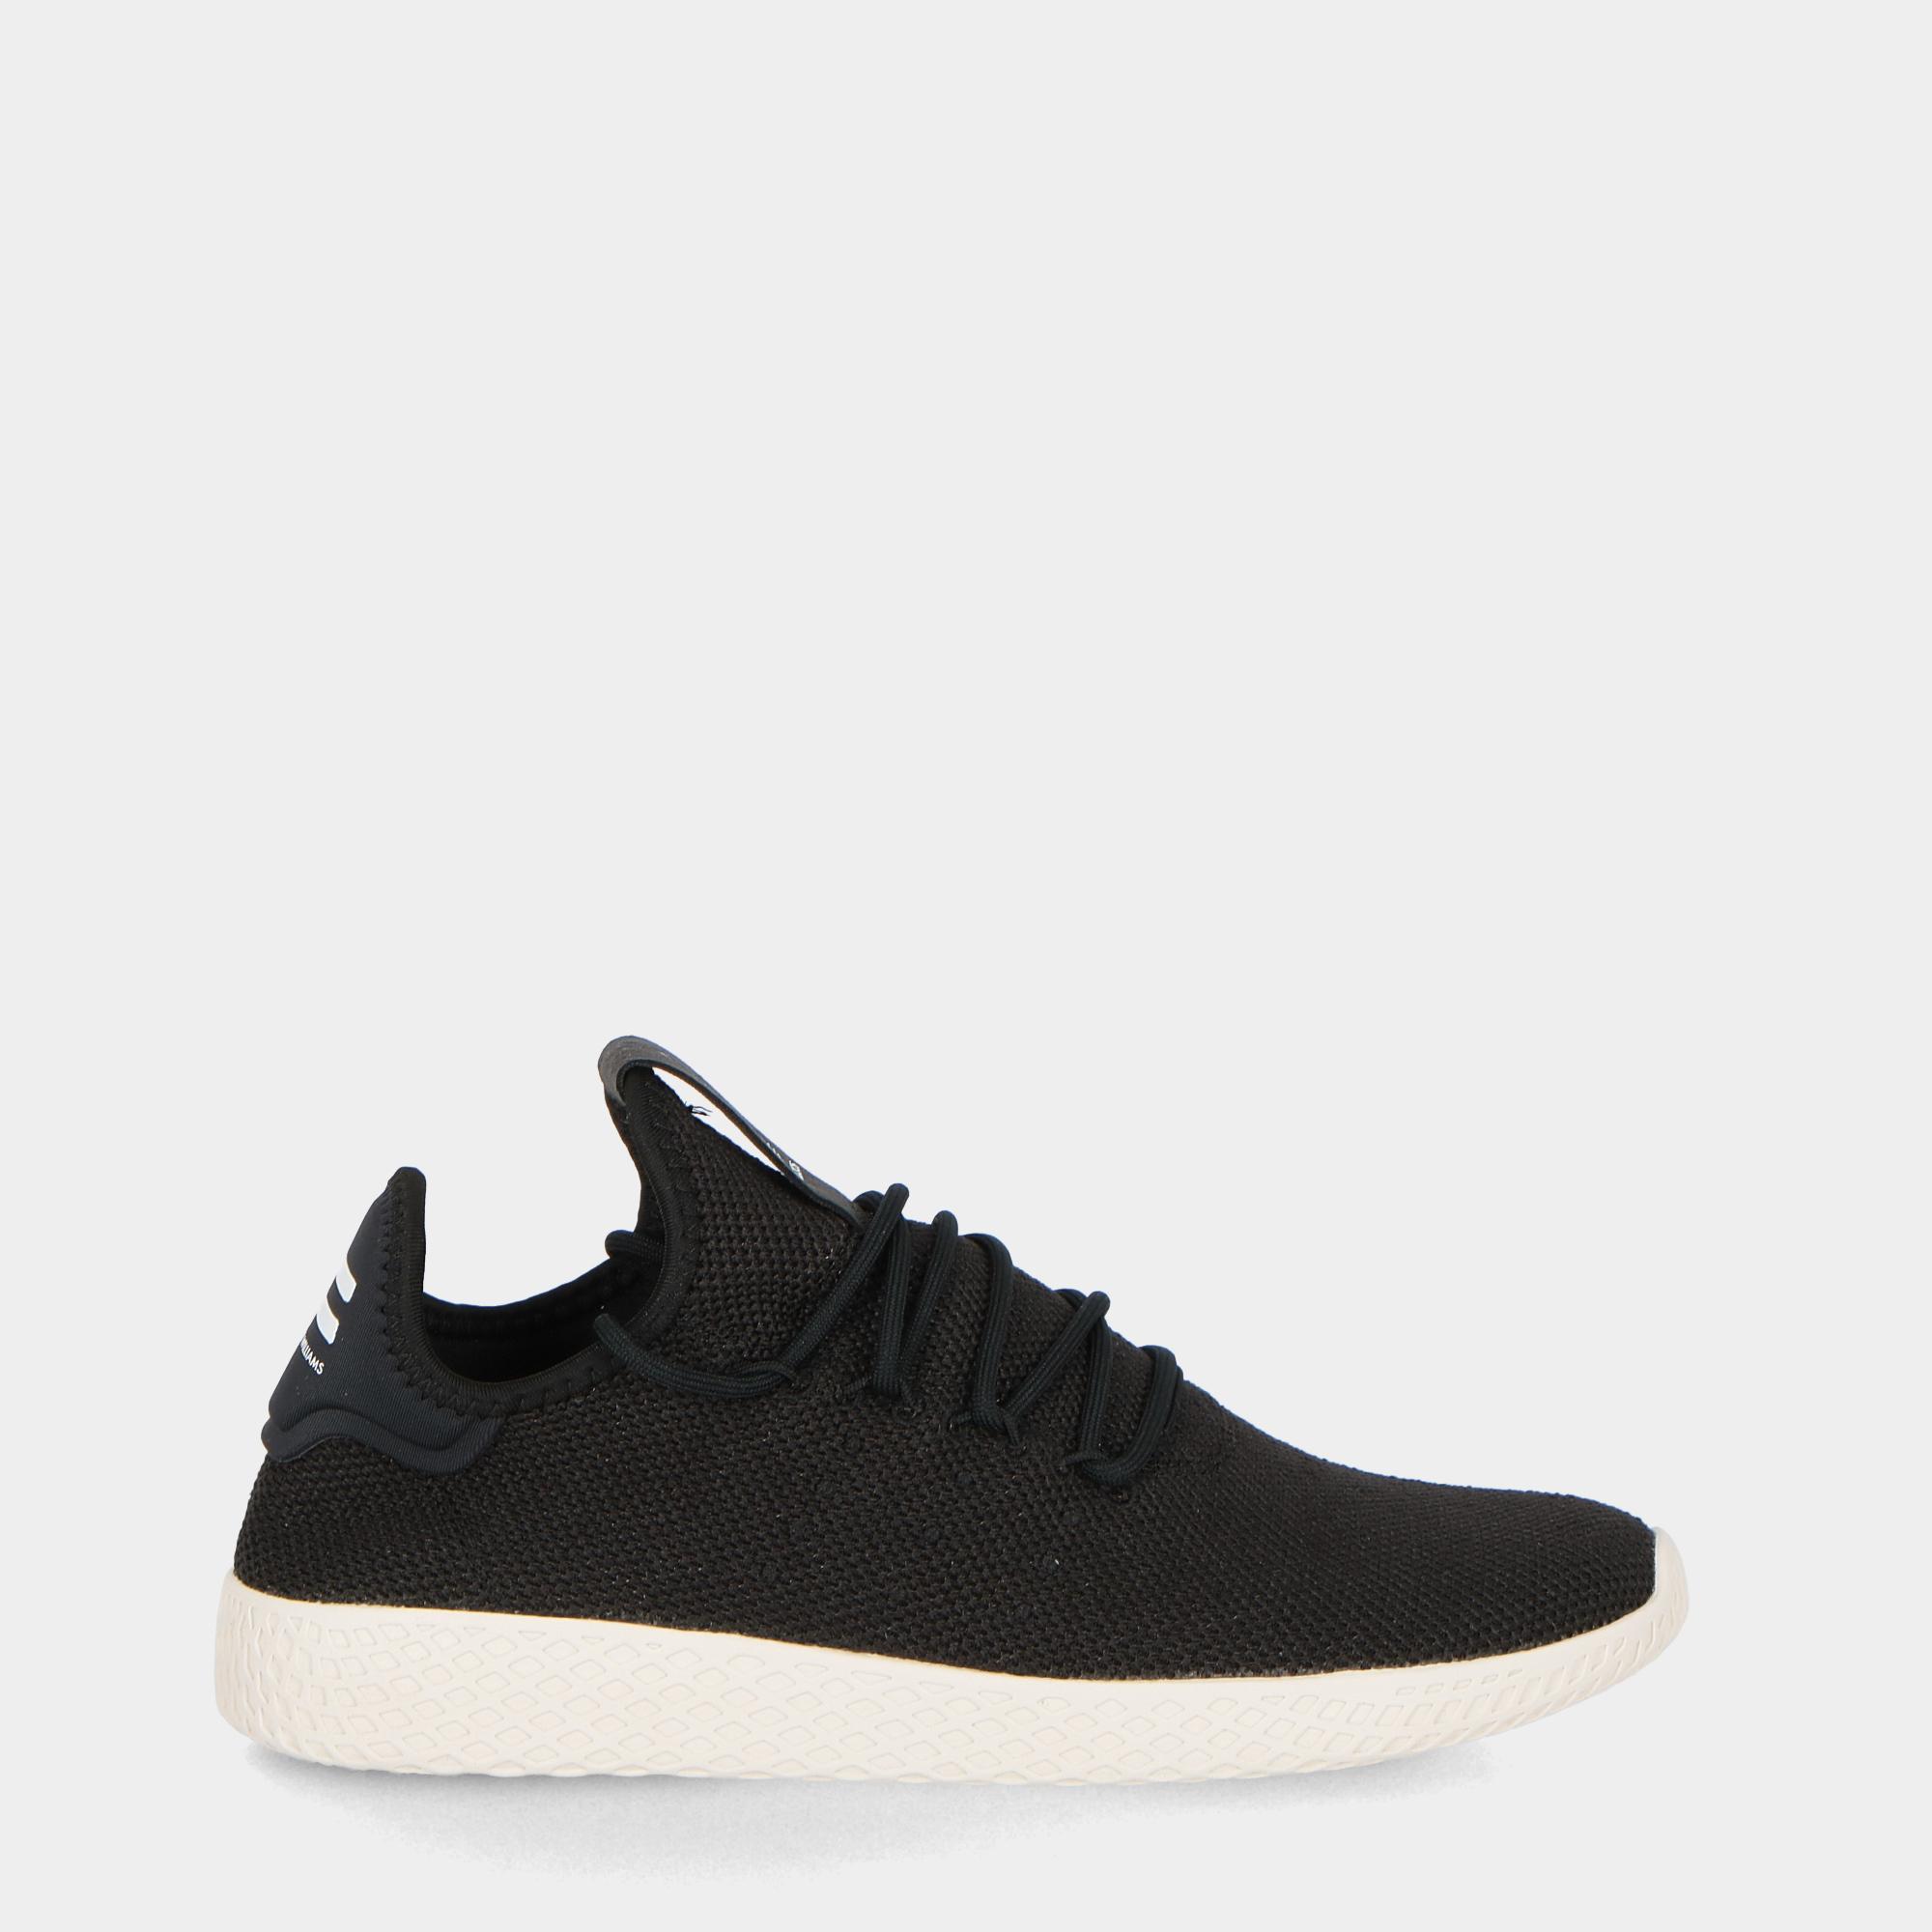 3078f8653 Adidas Pharrel Williams Tennis Hu Black Black White